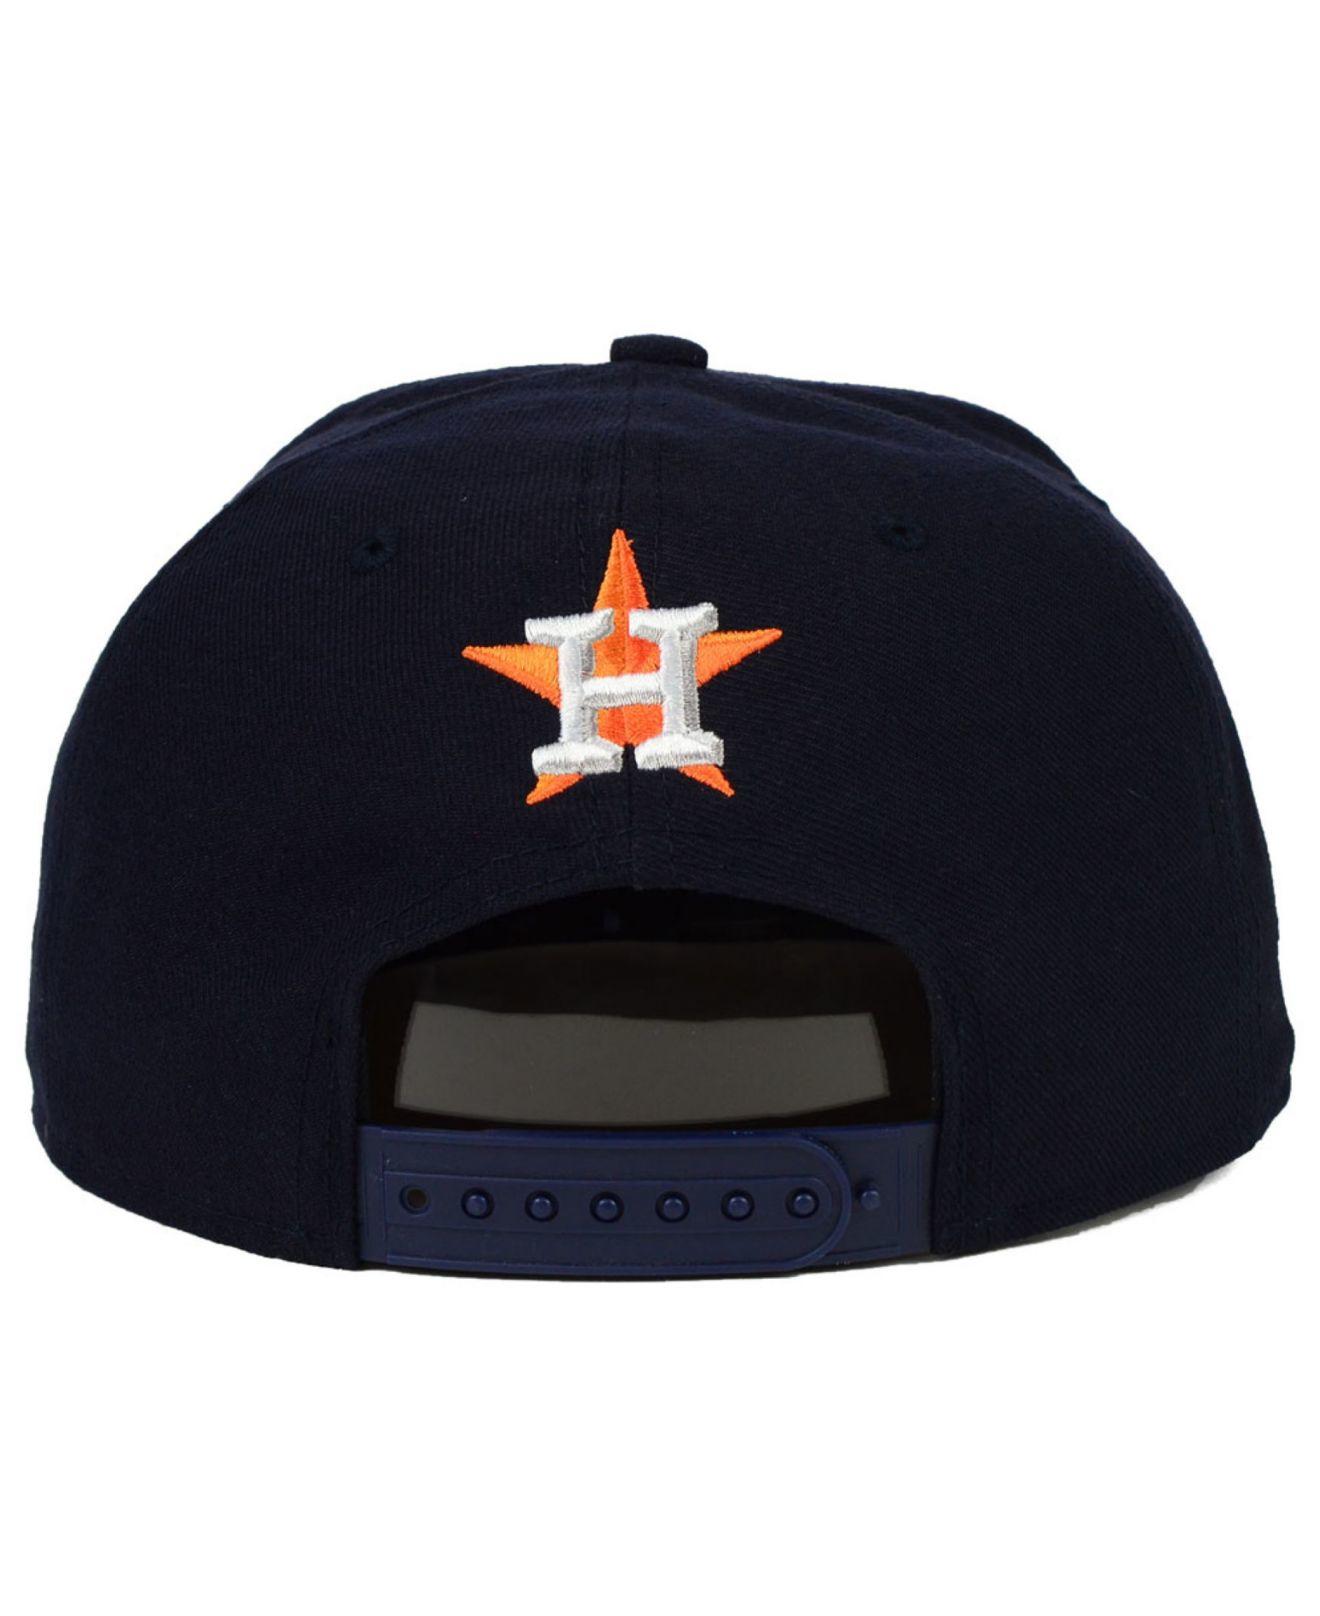 67d0bbb9b98 ... hats fittednew era baseball hatsfinest selection 6f6e3 9a74c  france  lyst ktz houston astros star wars logoswipe 9fifty snapback cap in 96ddf  3a4bf